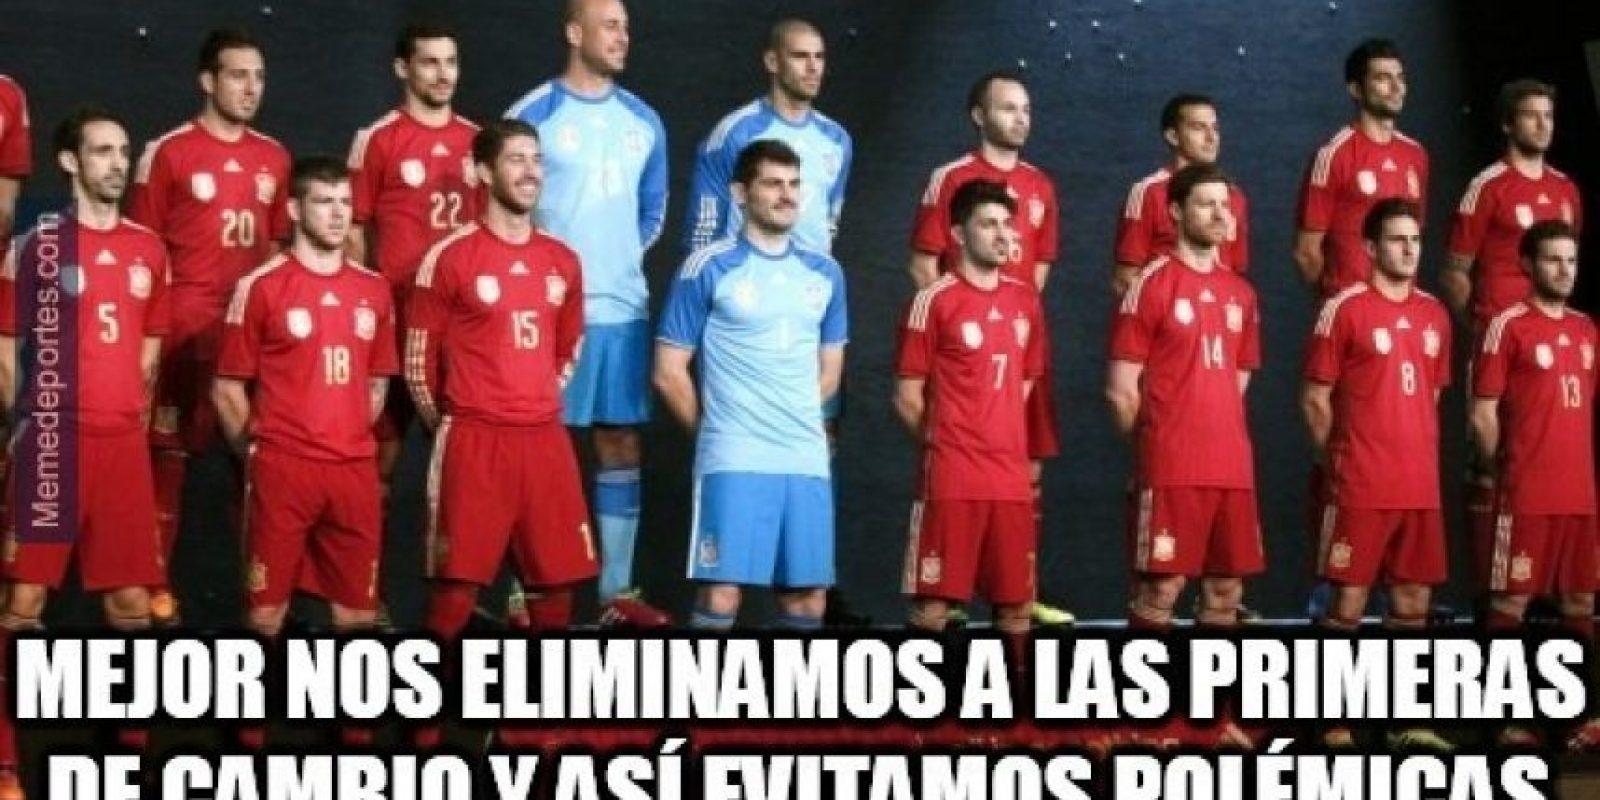 España decepcionó en el Mundial de Brasil Foto:Twitter